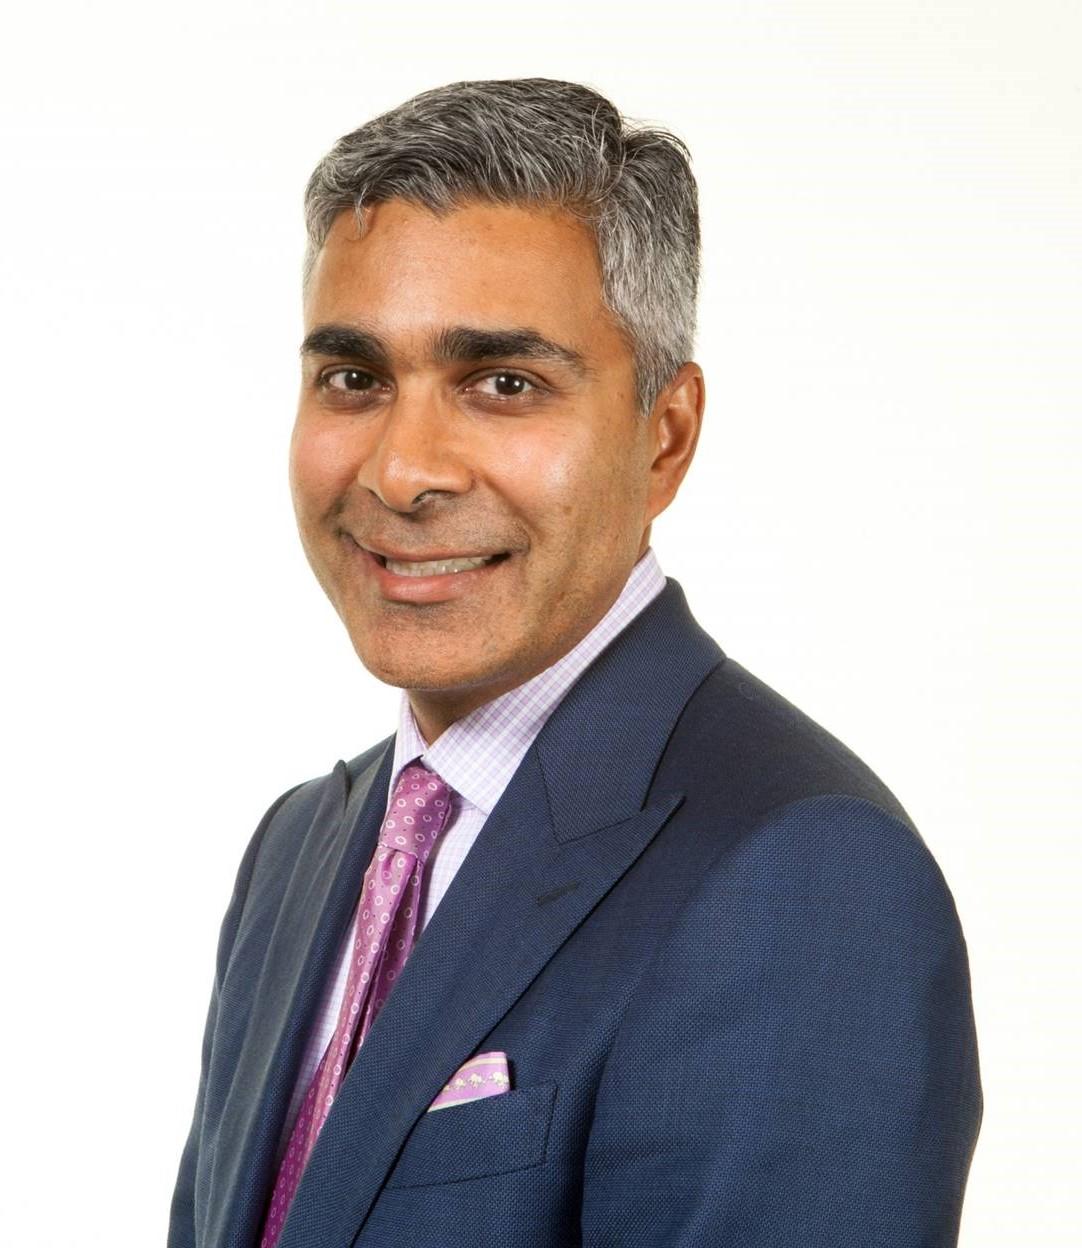 SANJAY RAO, MD - ophthalmologist